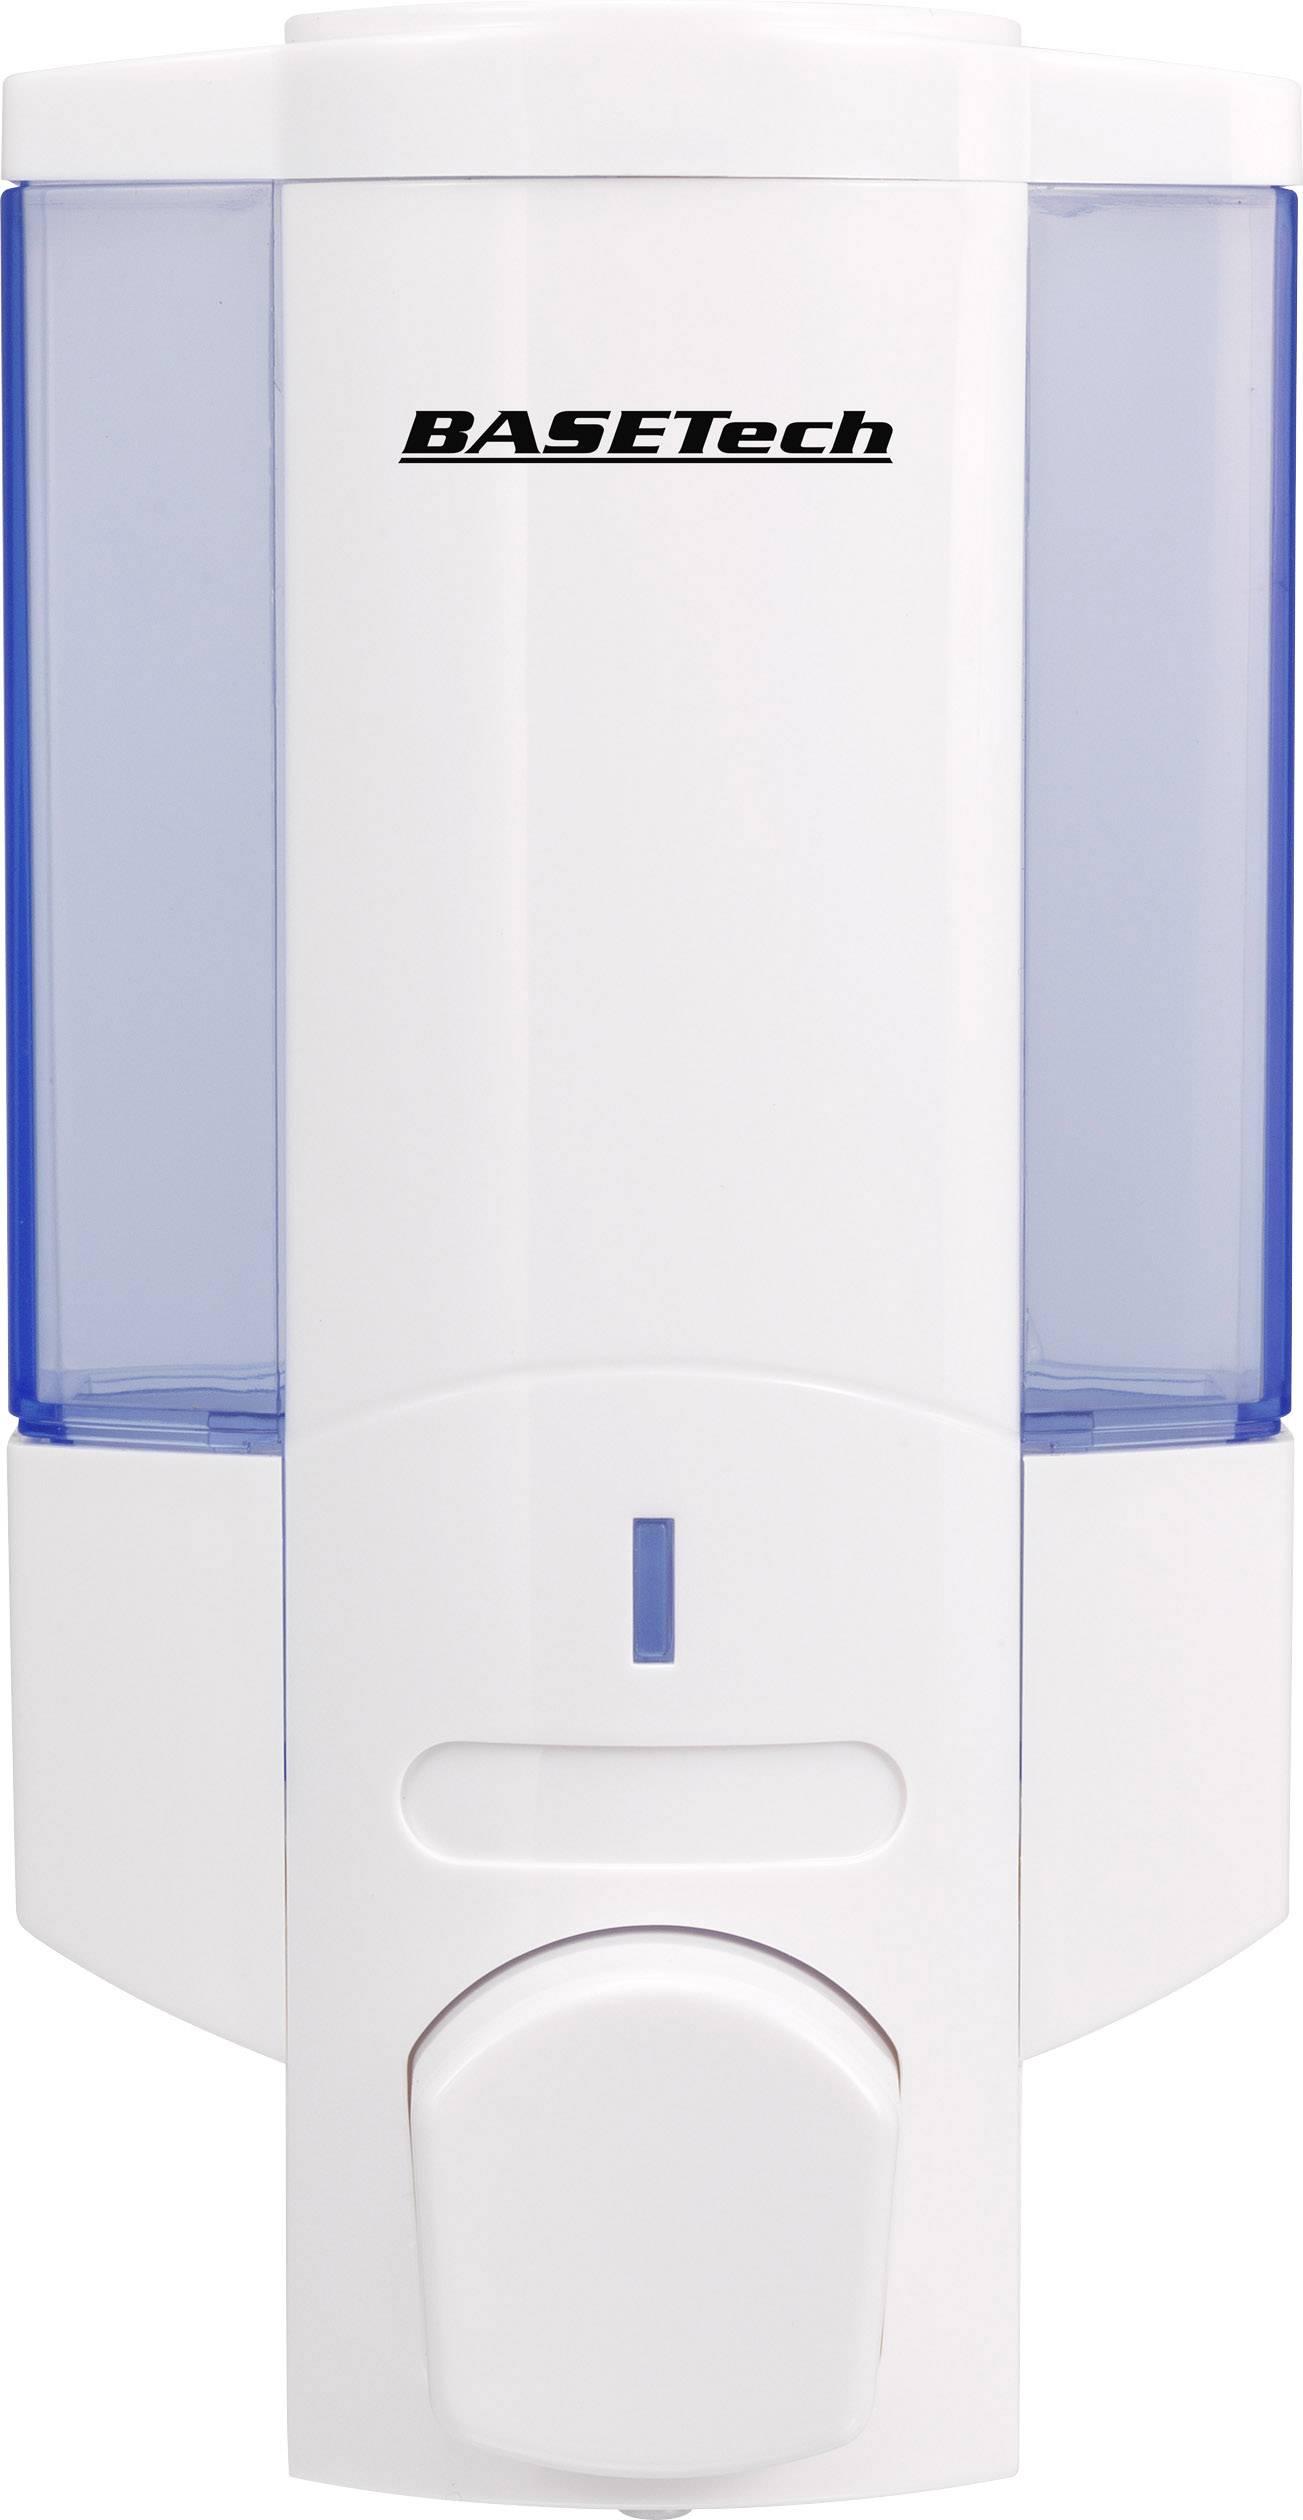 Dávkovač tekutého mydla Basetech V-6101, 350 ml, biela